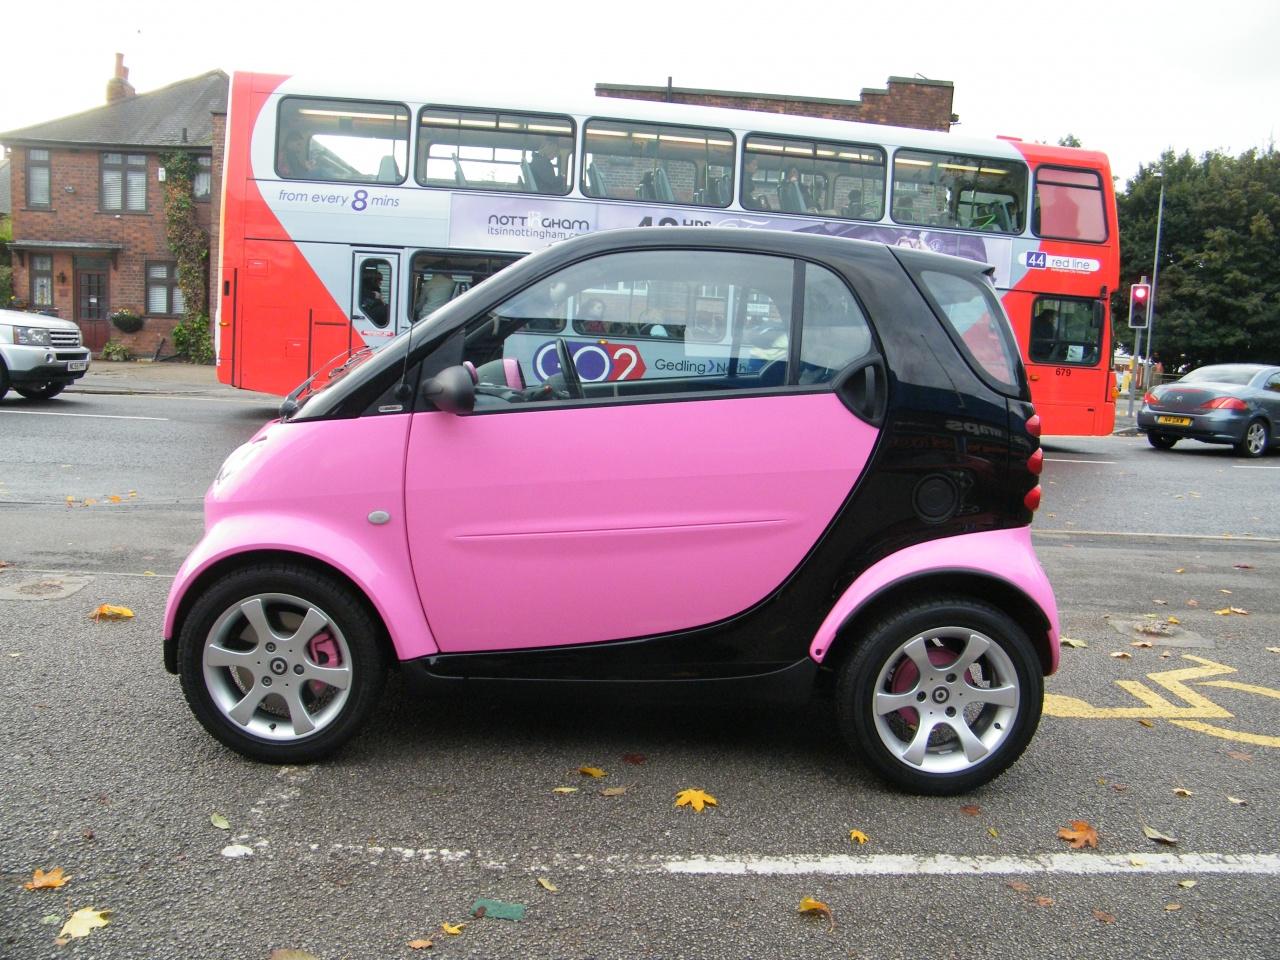 Car wrap 3 pink smart car wrap 4 pink smart car wrap 5